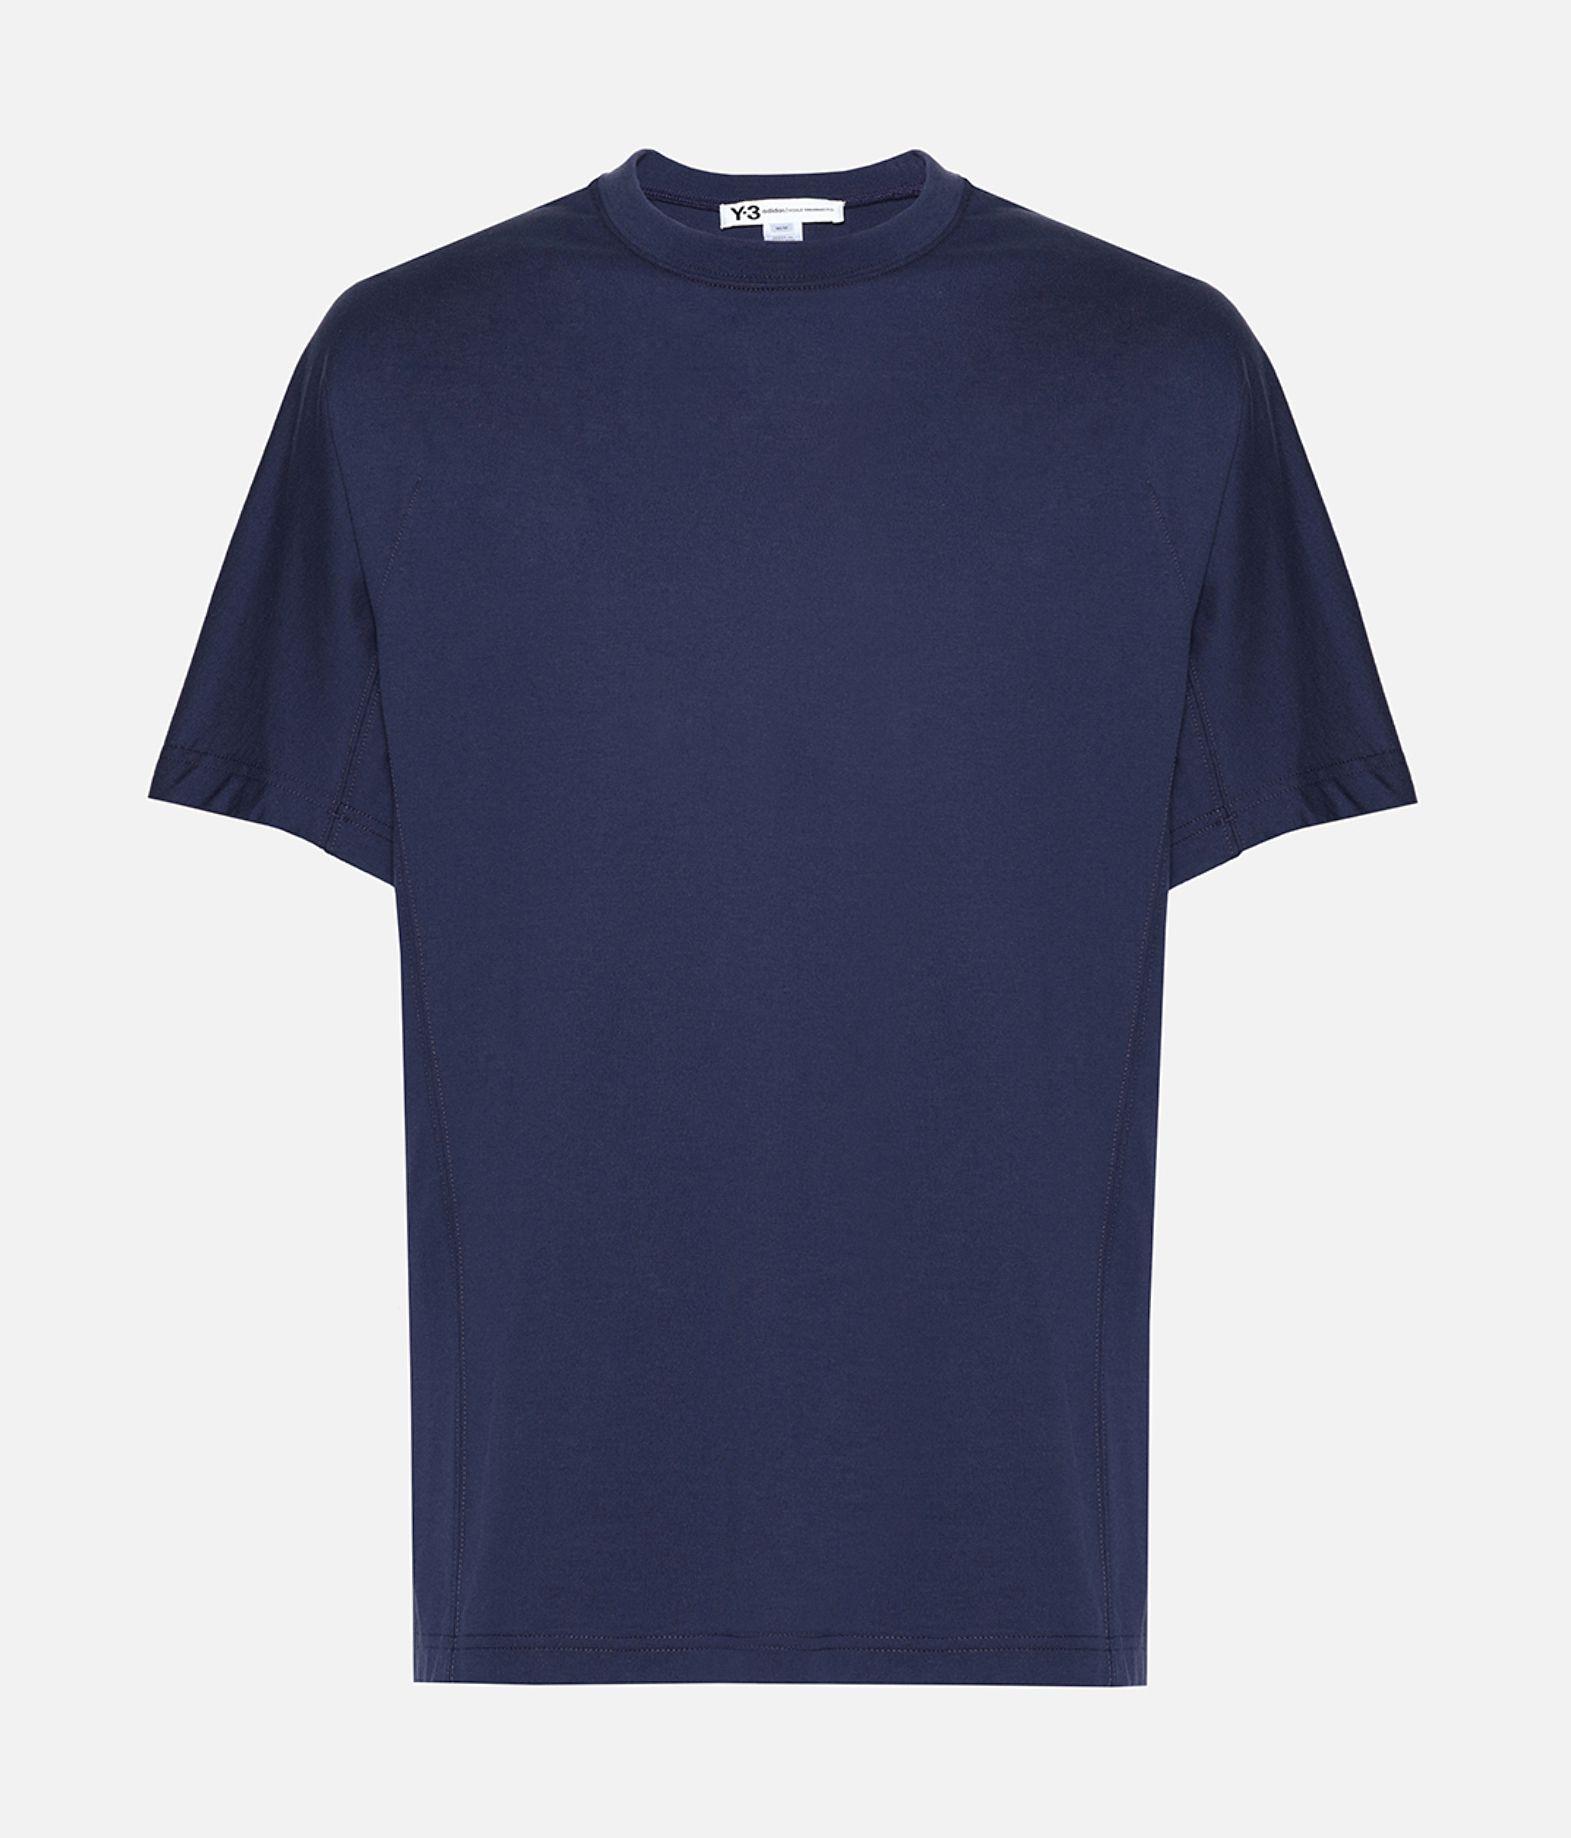 Y-3 Y-3 Classic Crewneck Tee Short sleeve t-shirt Man f